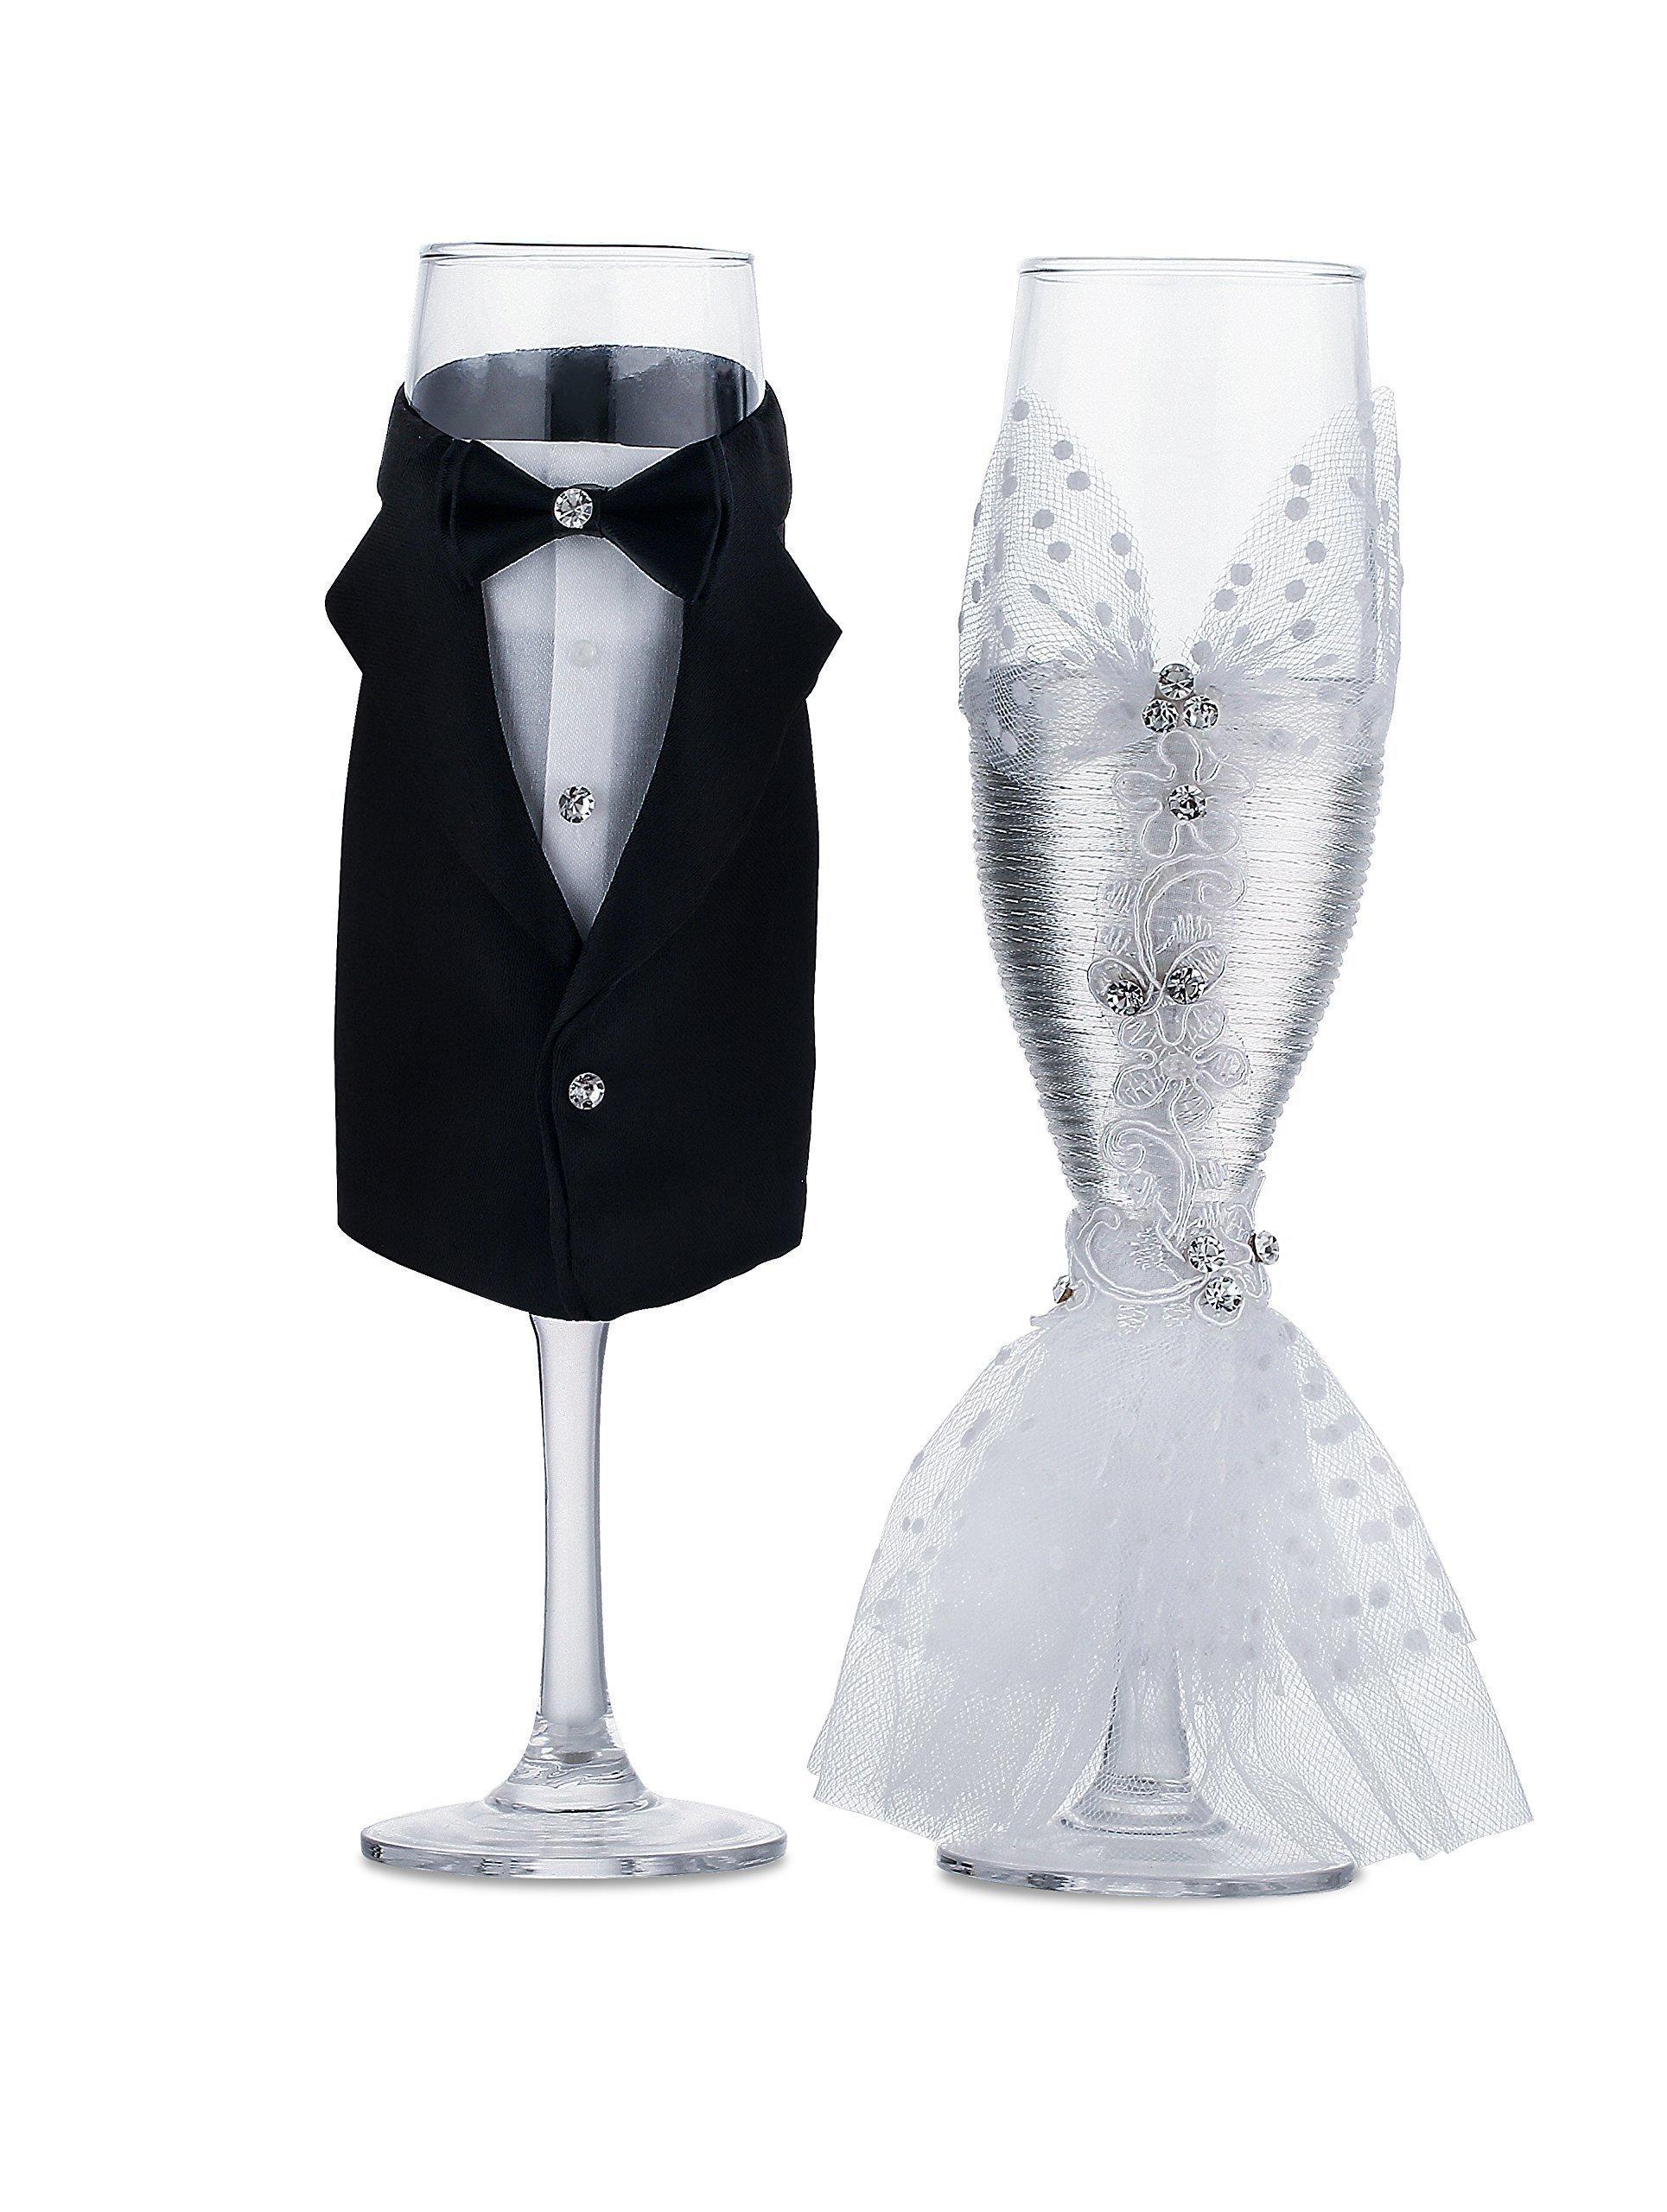 Cheap Wedding Favors Wine Glasses Find Wedding Favors Wine Glasses